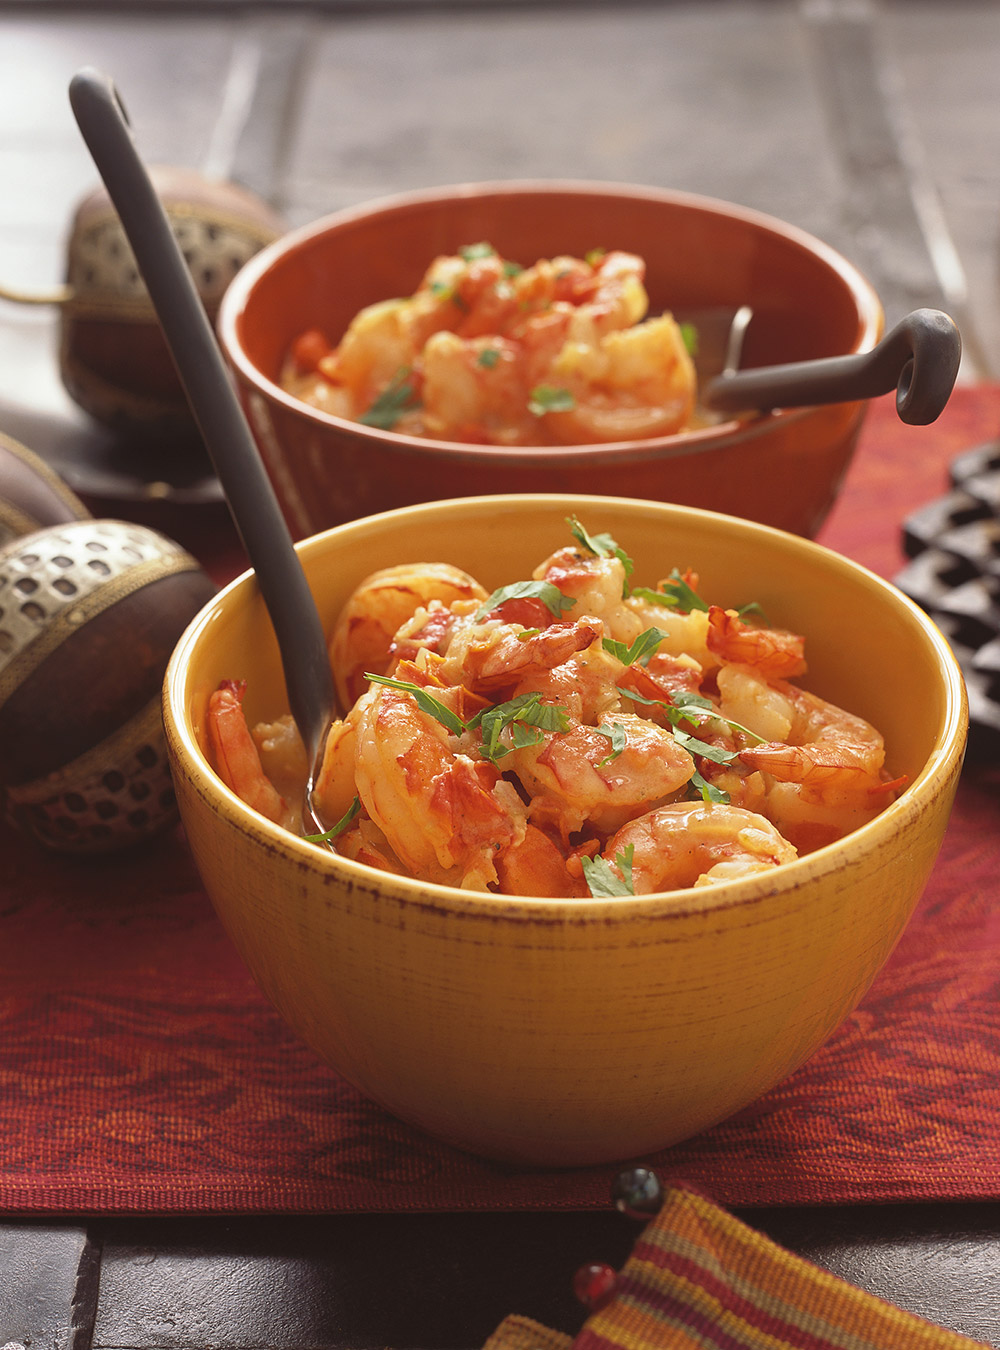 Cari de crevettes | ricardo